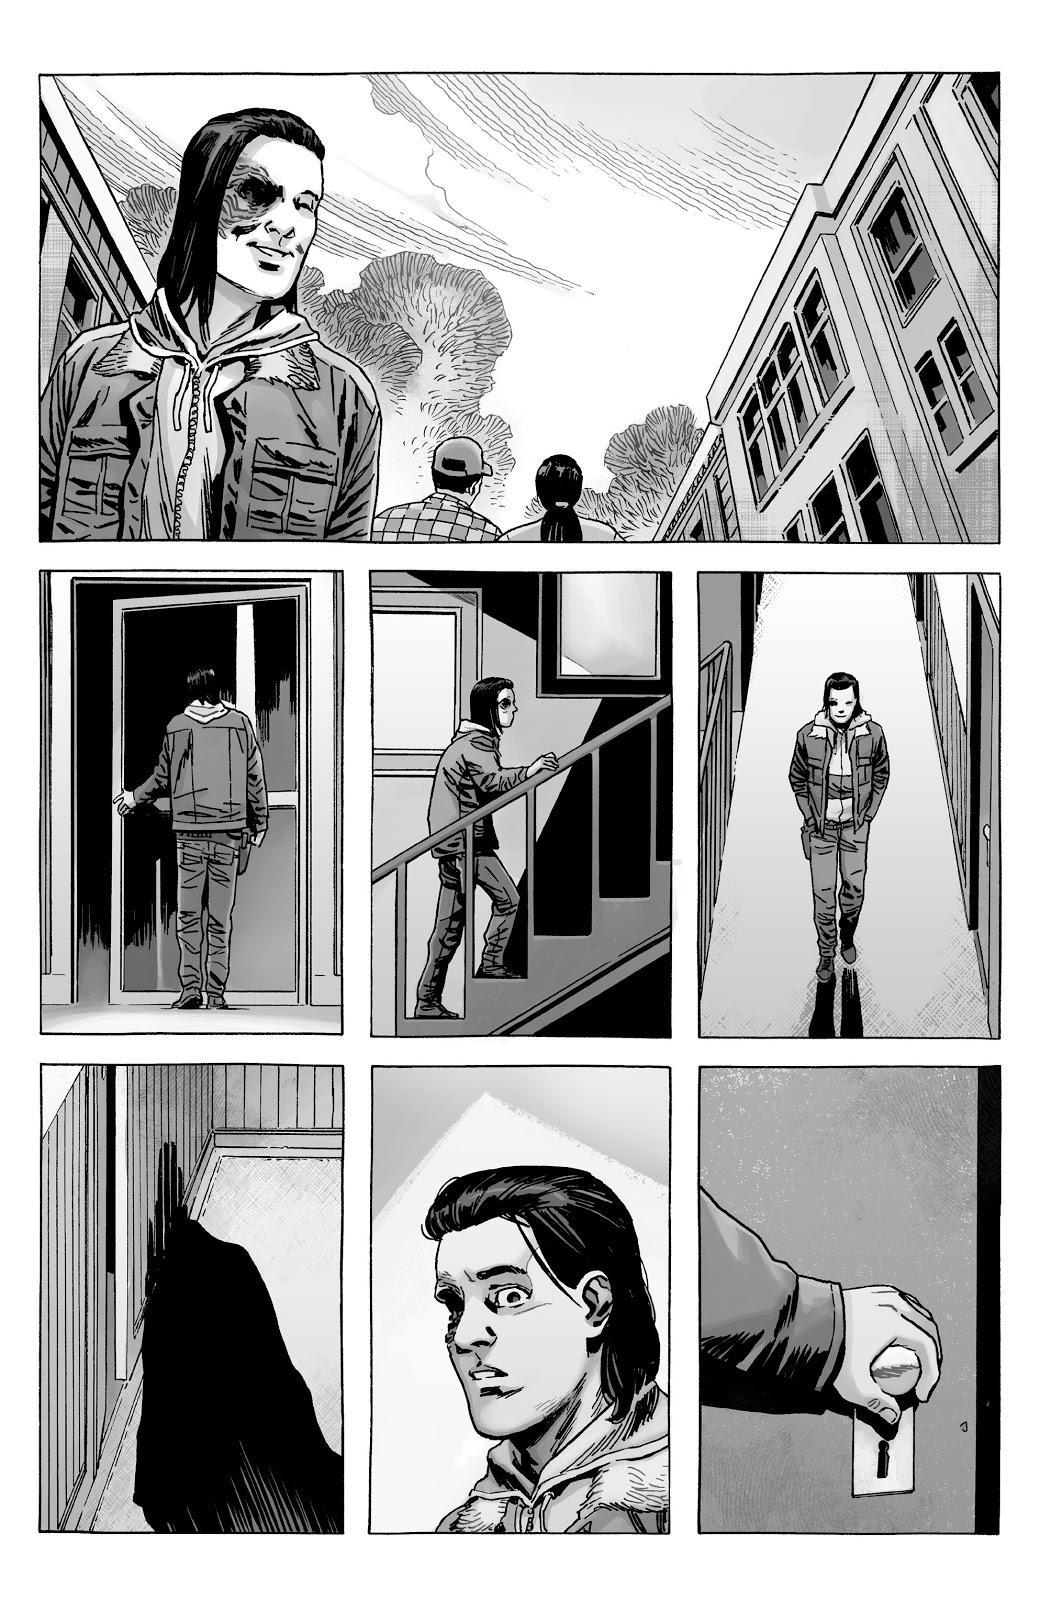 Carl Grimes Kills Zombie Rick Grimes (The Walking Dead)